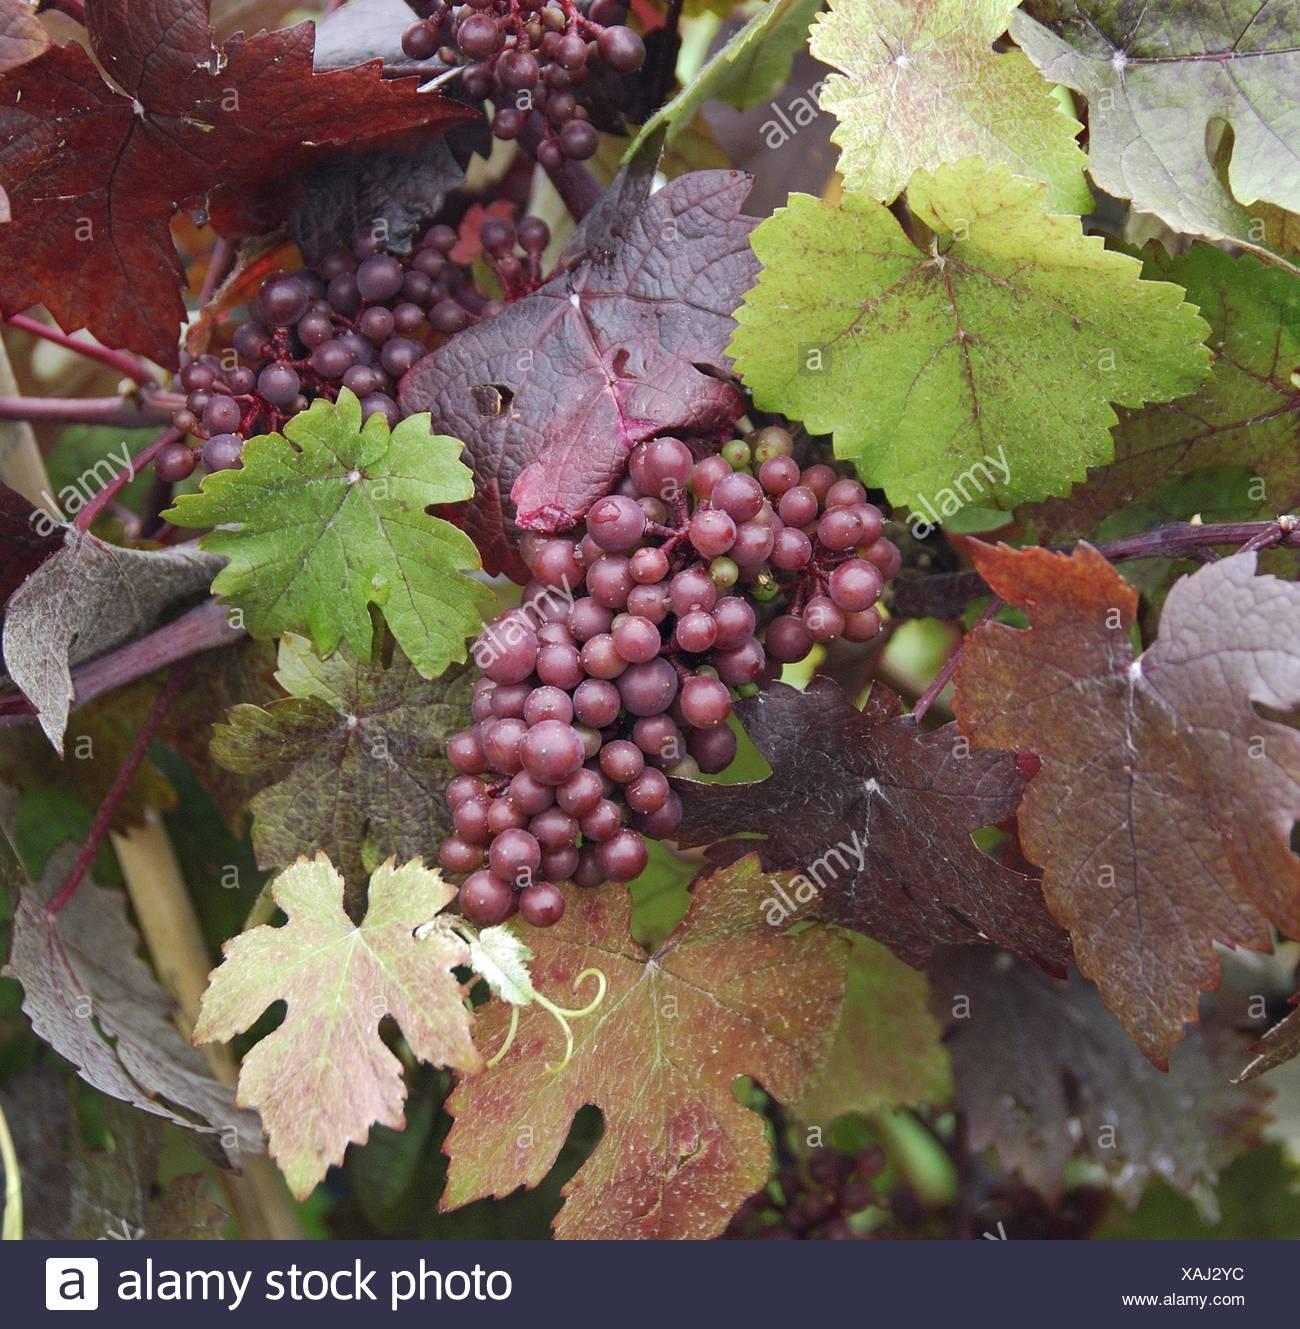 grape-vine, vine (Vitis vinifera 'Purpurea', Vitis vinifera Purpurea), cultivar Purpurea, Germany - Stock Image